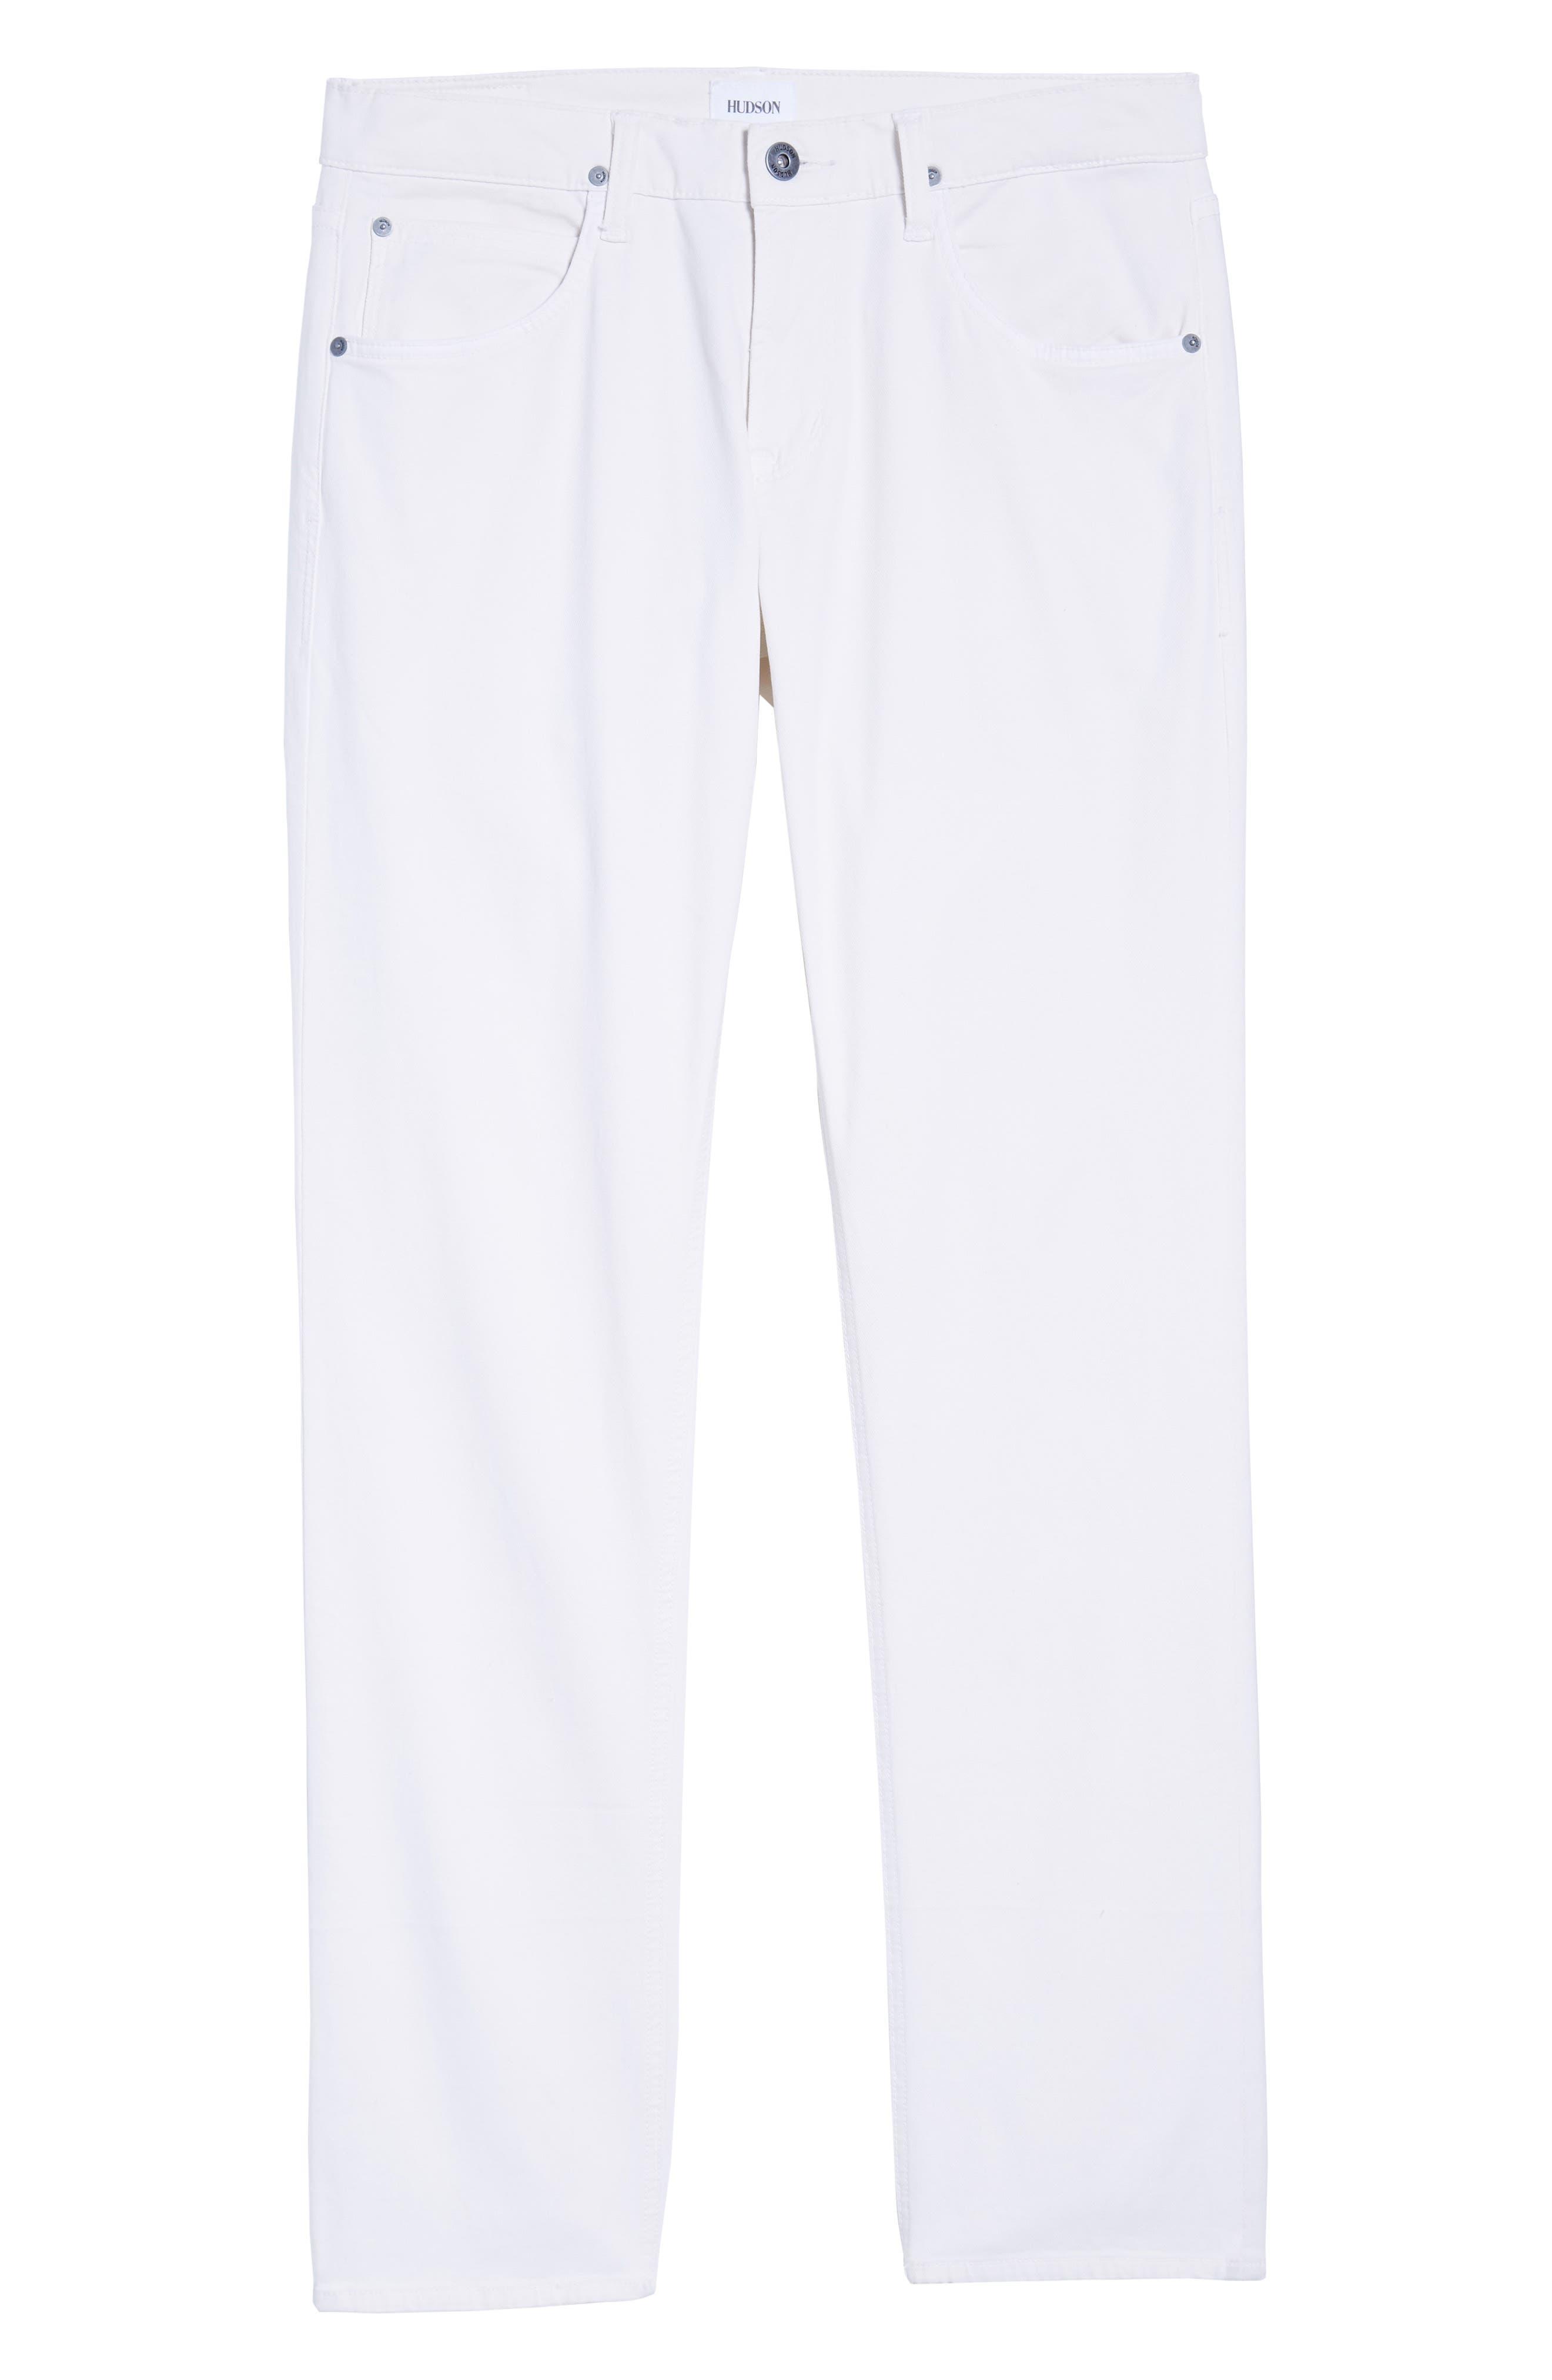 Blake Slim Fit Jeans,                             Alternate thumbnail 6, color,                             110